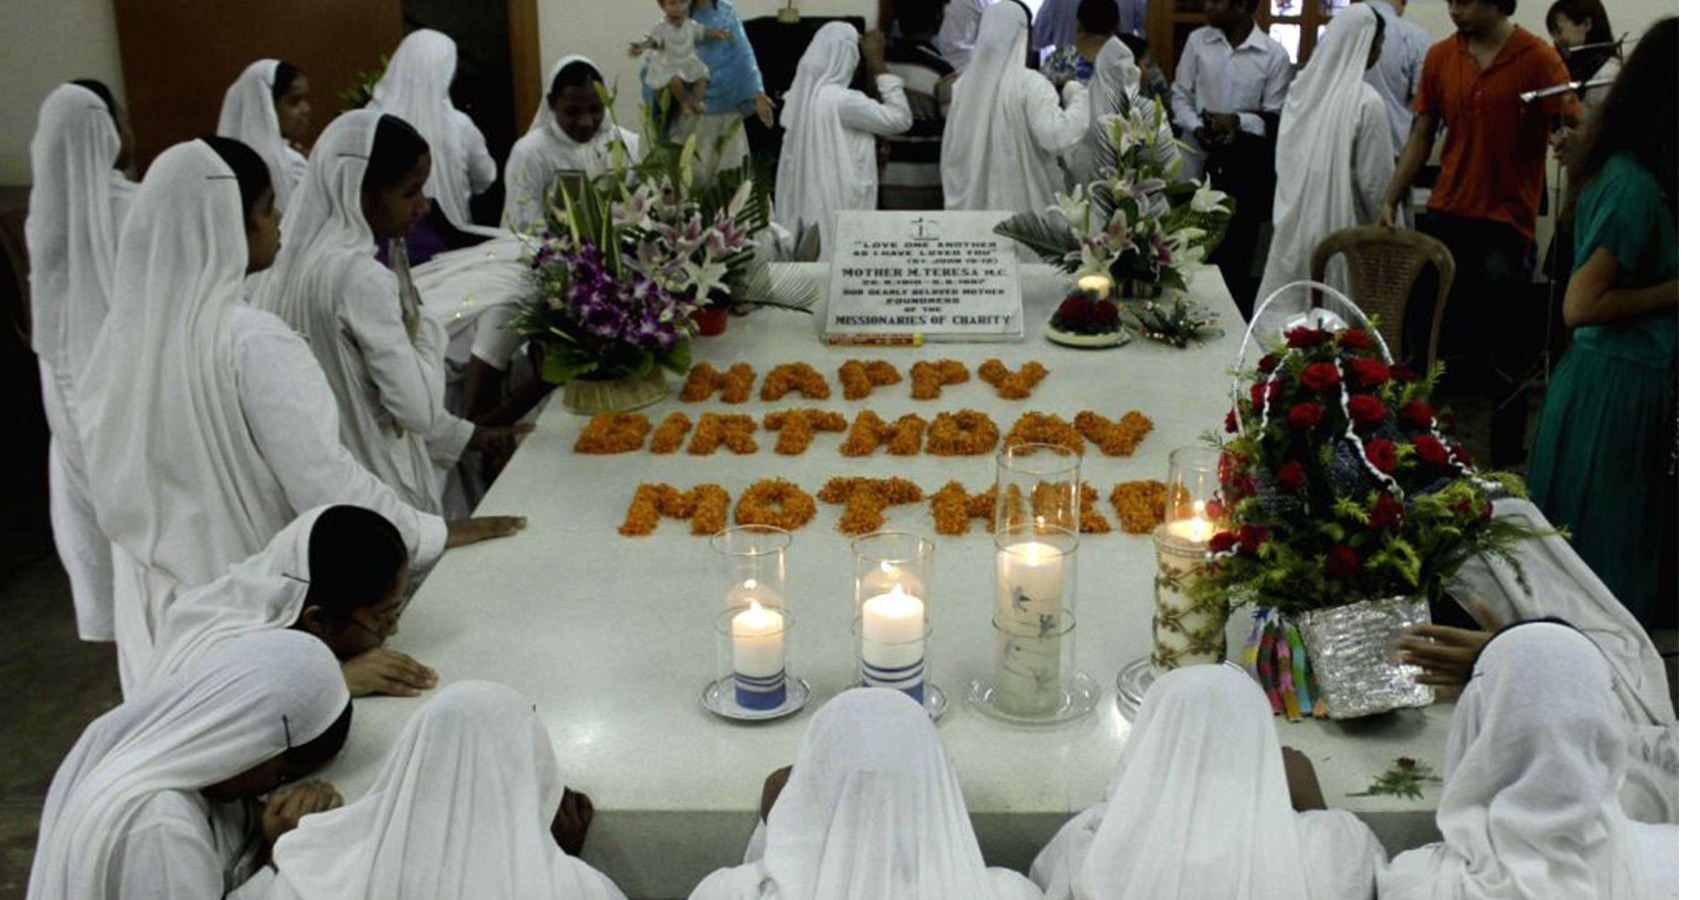 Mother Teresa's Birth Anniversary Celebrated